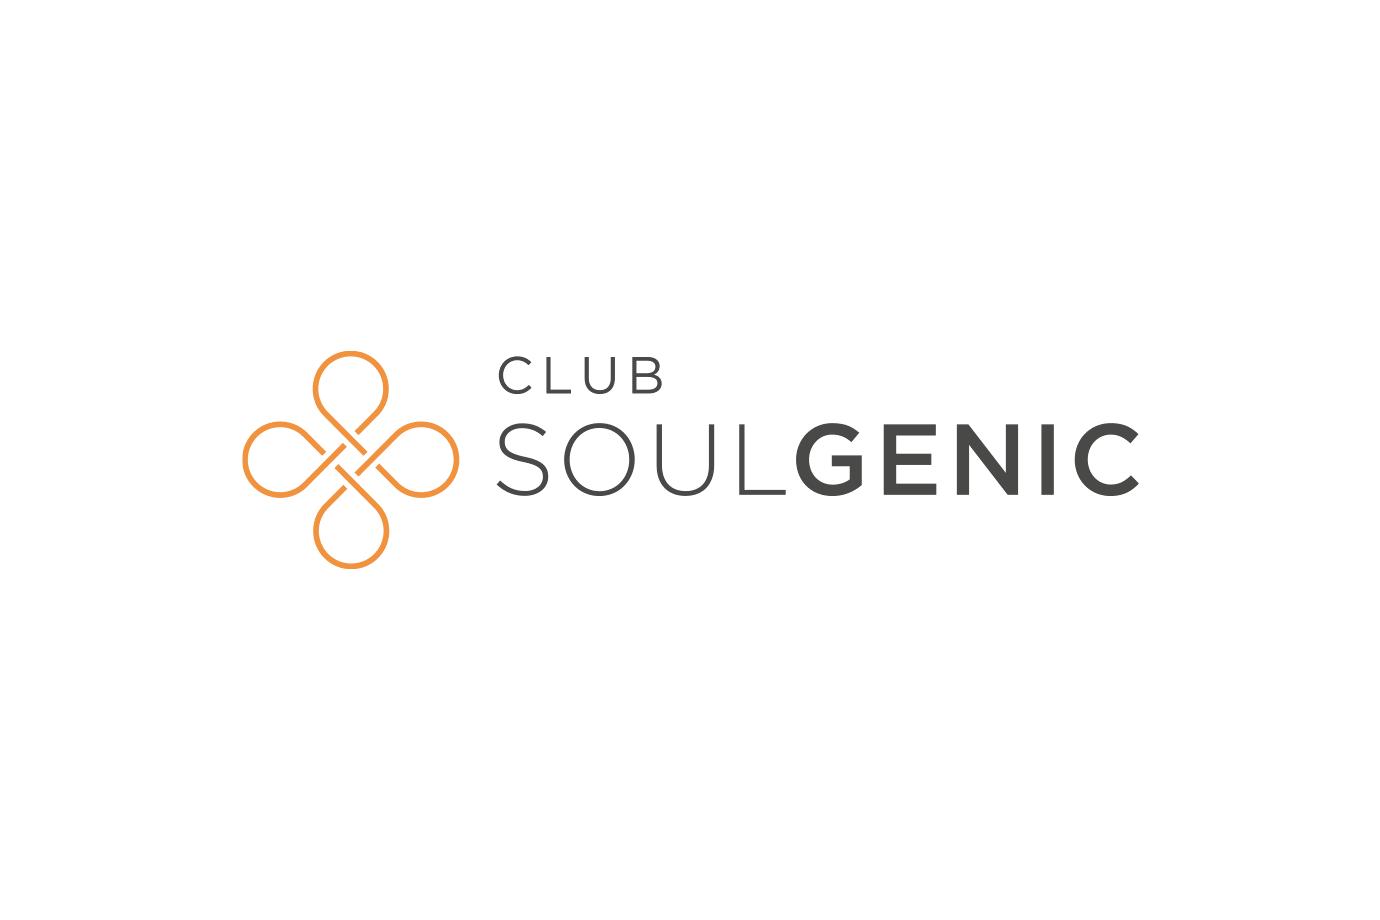 Soulgenic & Club Soulgenic